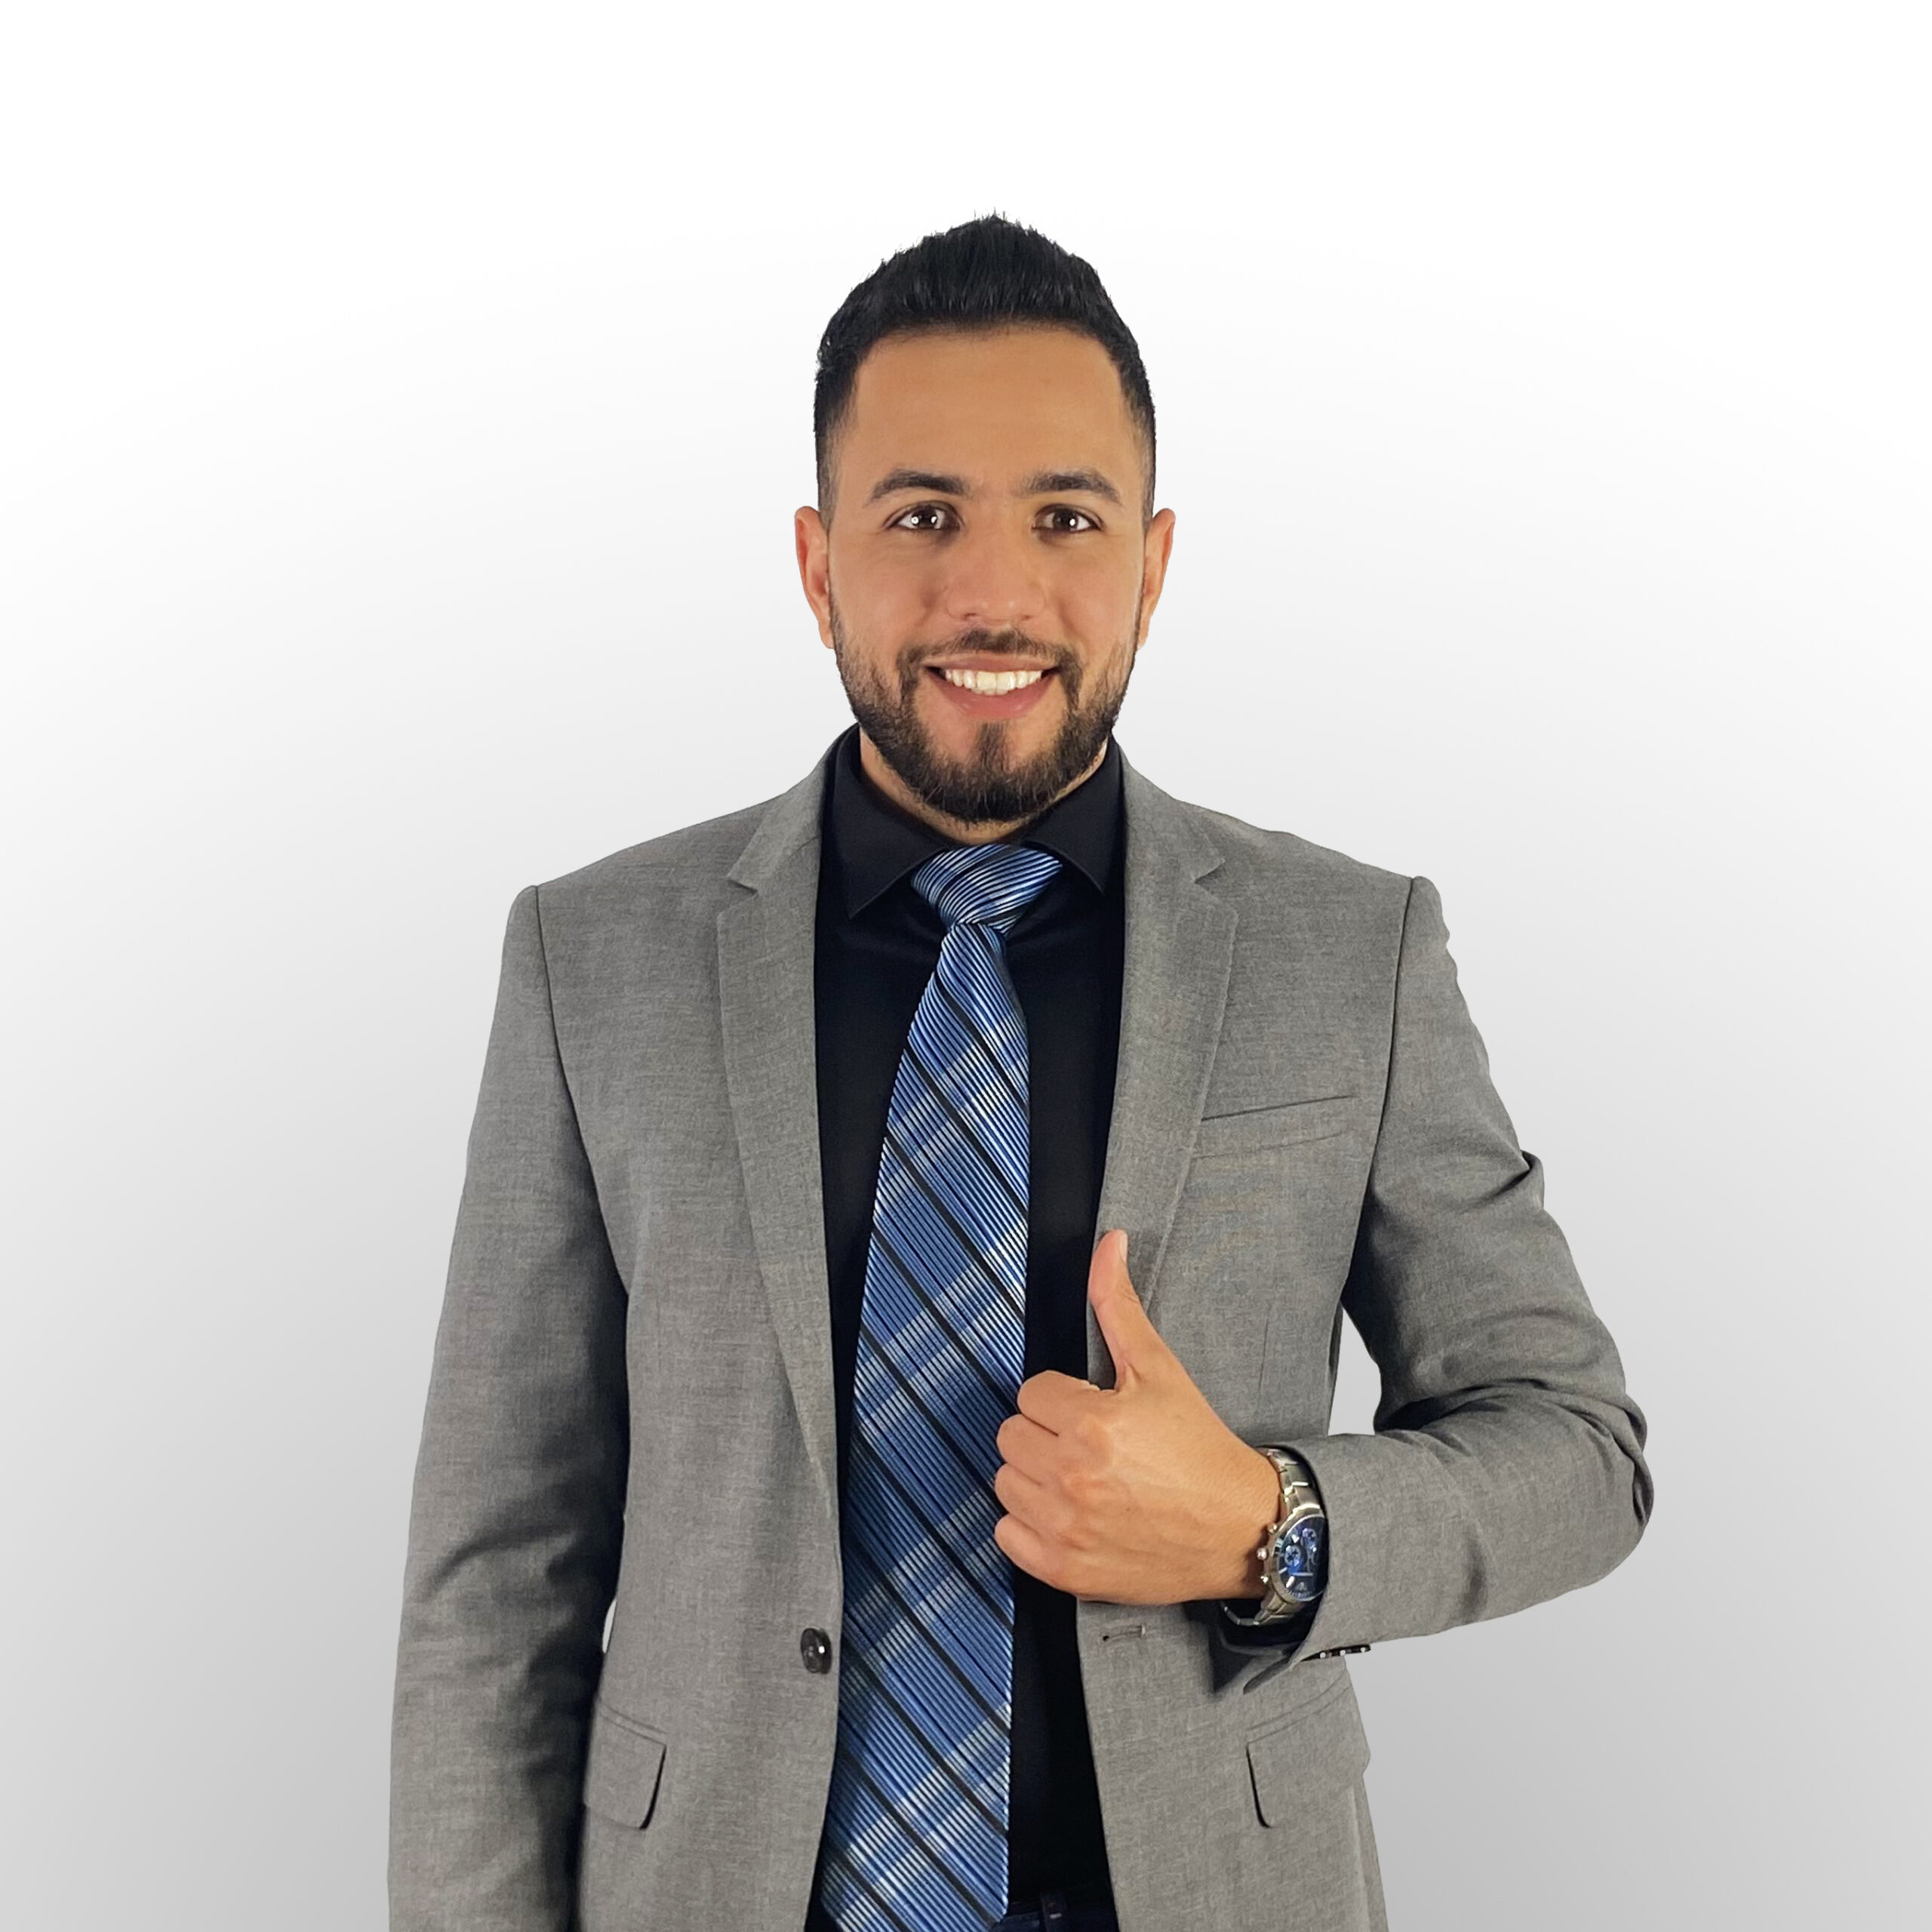 Ali Khamis